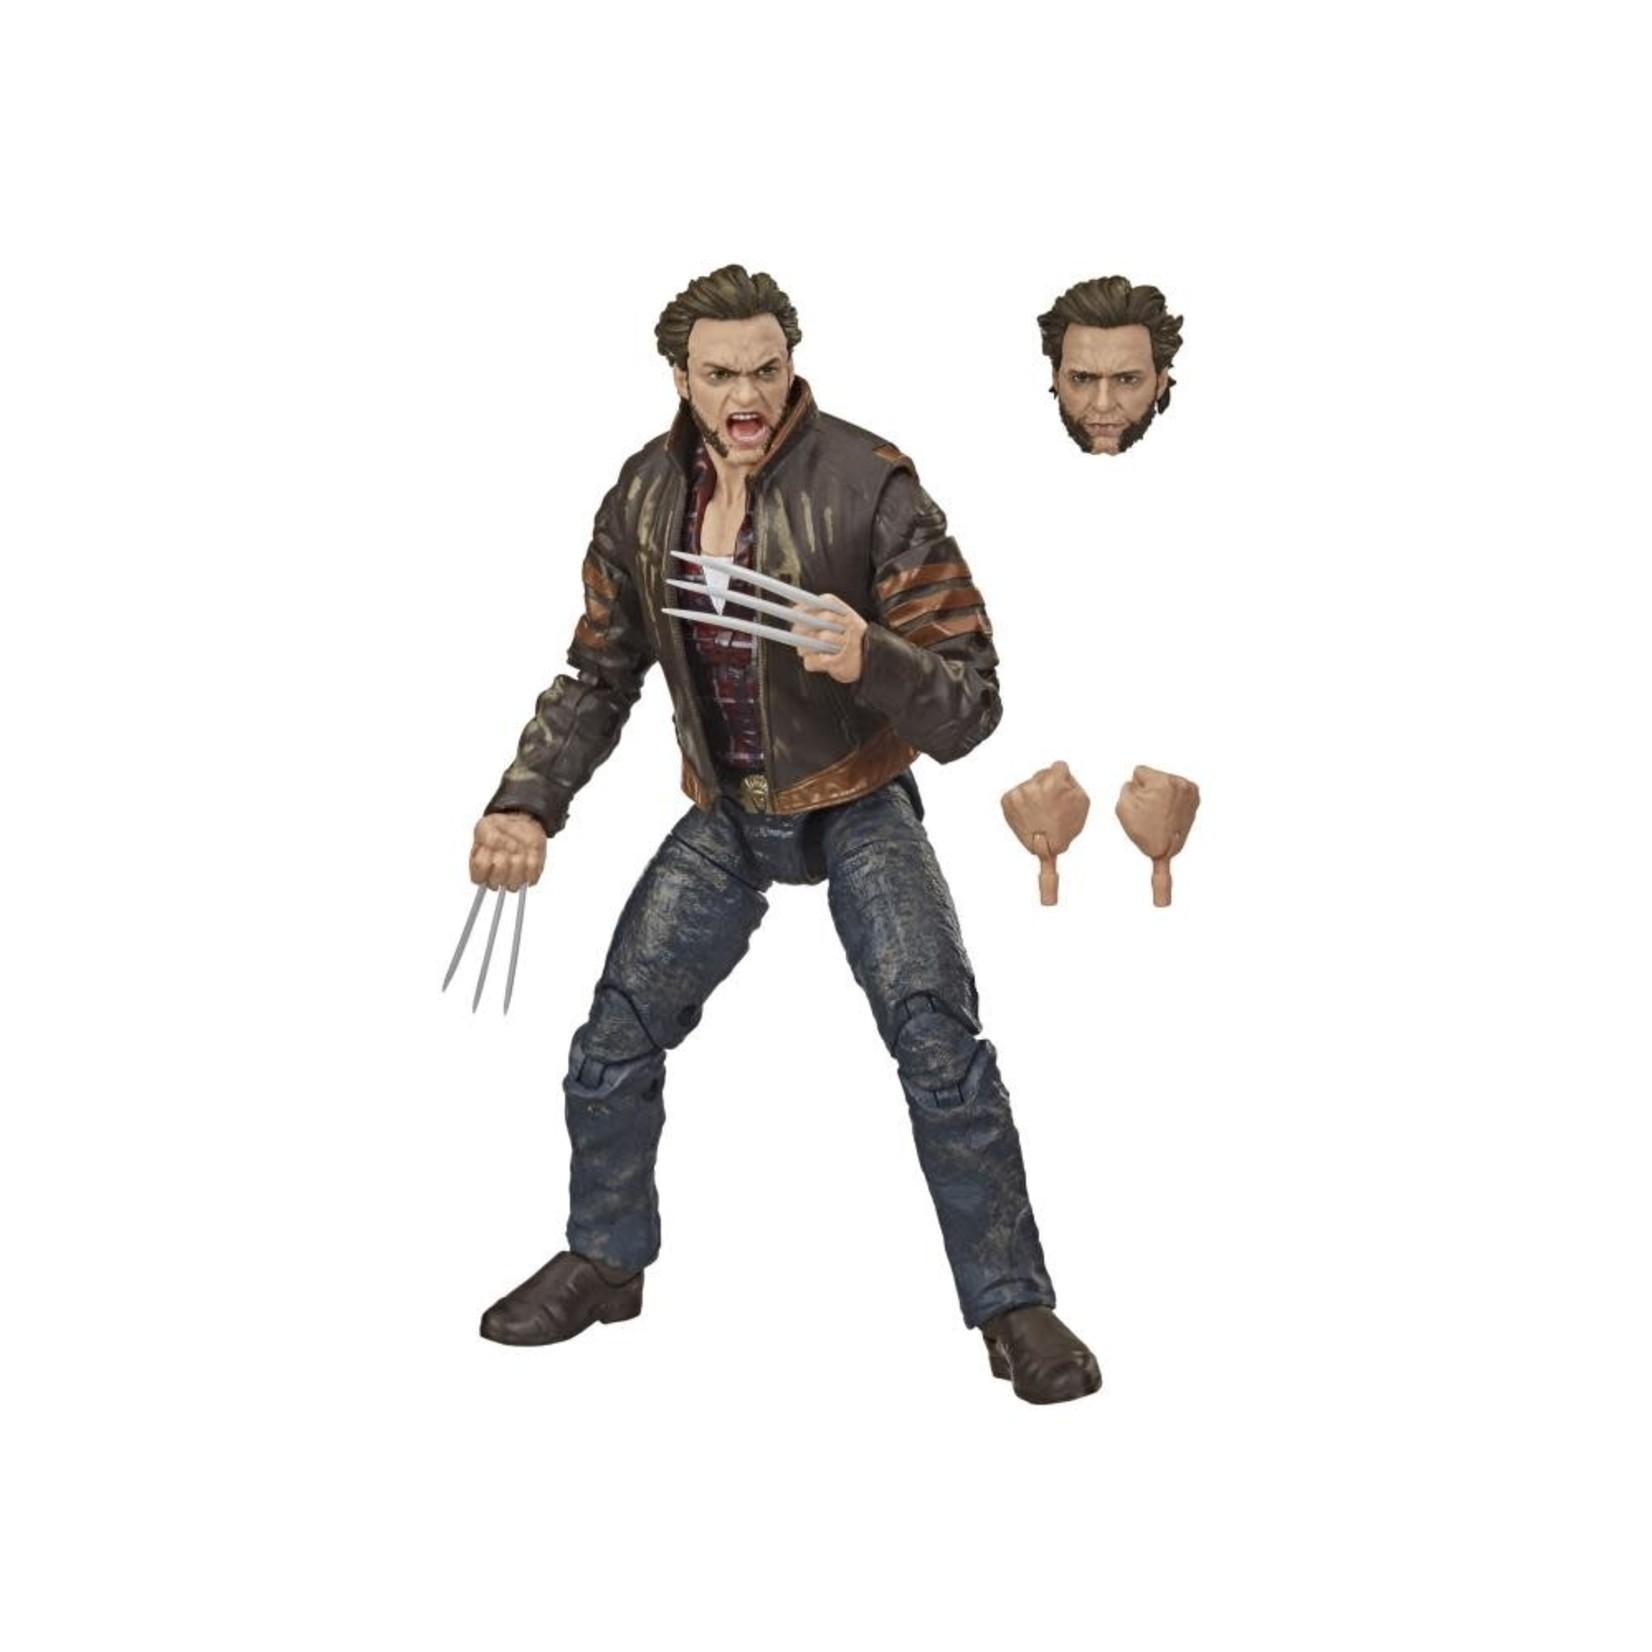 Hasbro X-Men (2000) 20th Anniversary Marvel Legends Wolverine